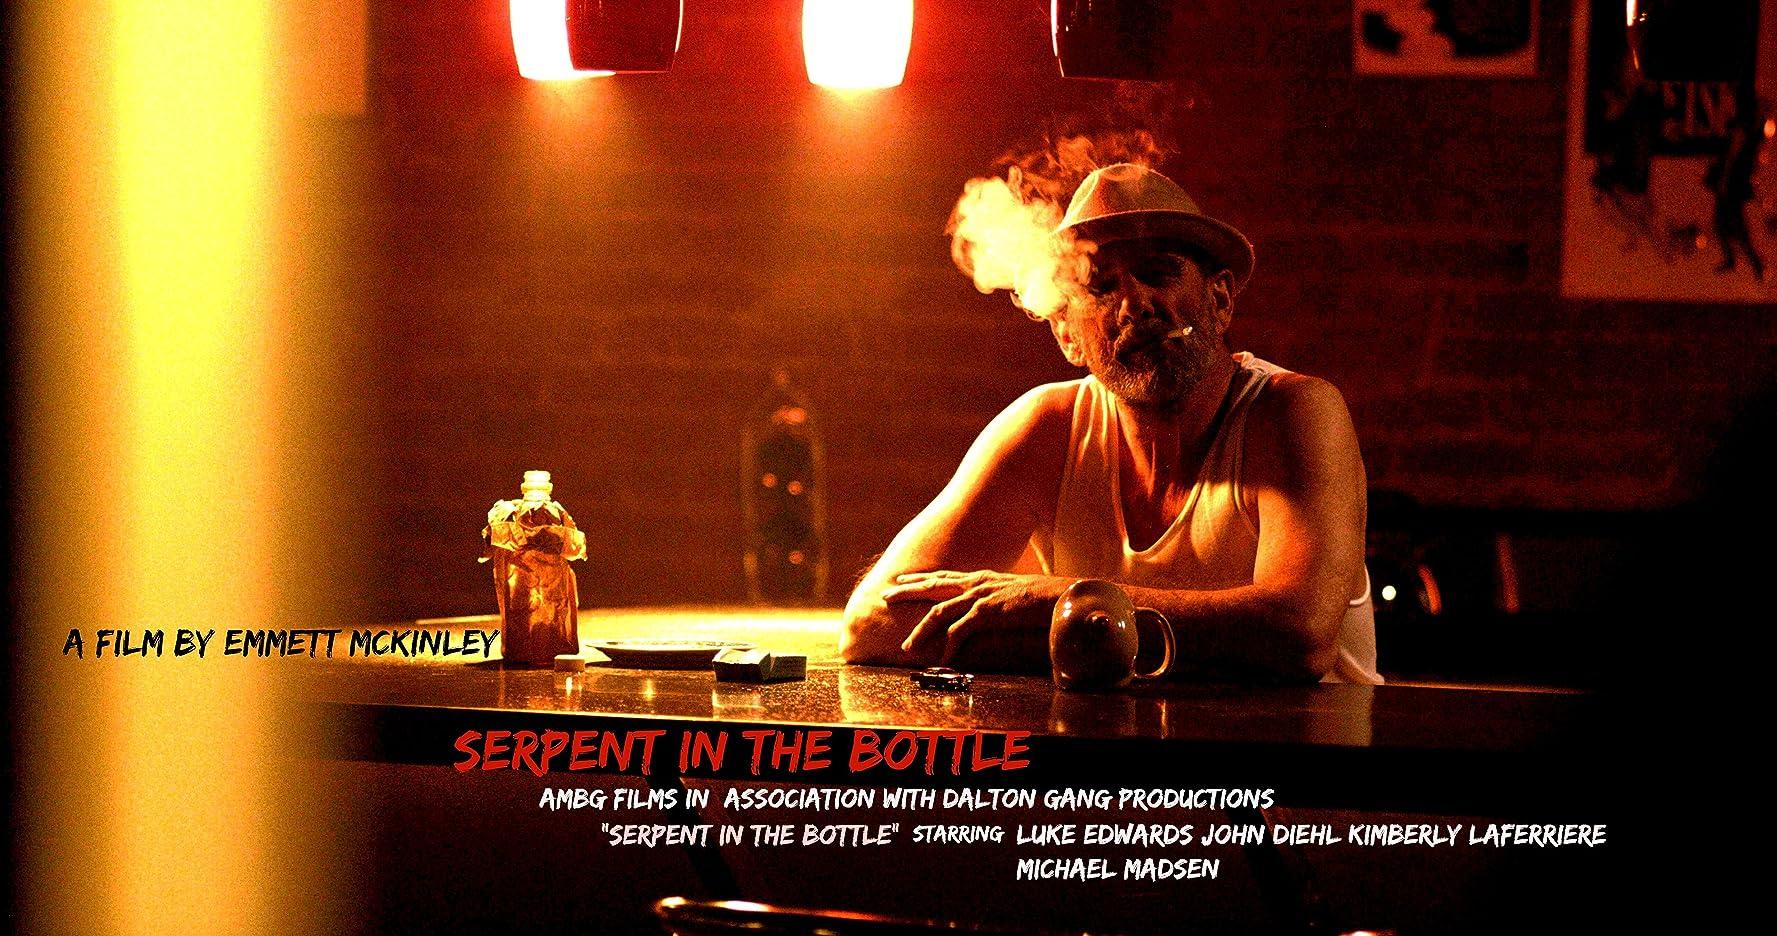 Thomas Wilson Brown, John Diehl, Luke Edwards, and Kimberly Laferriere in Serpent in the Bottle (2020)